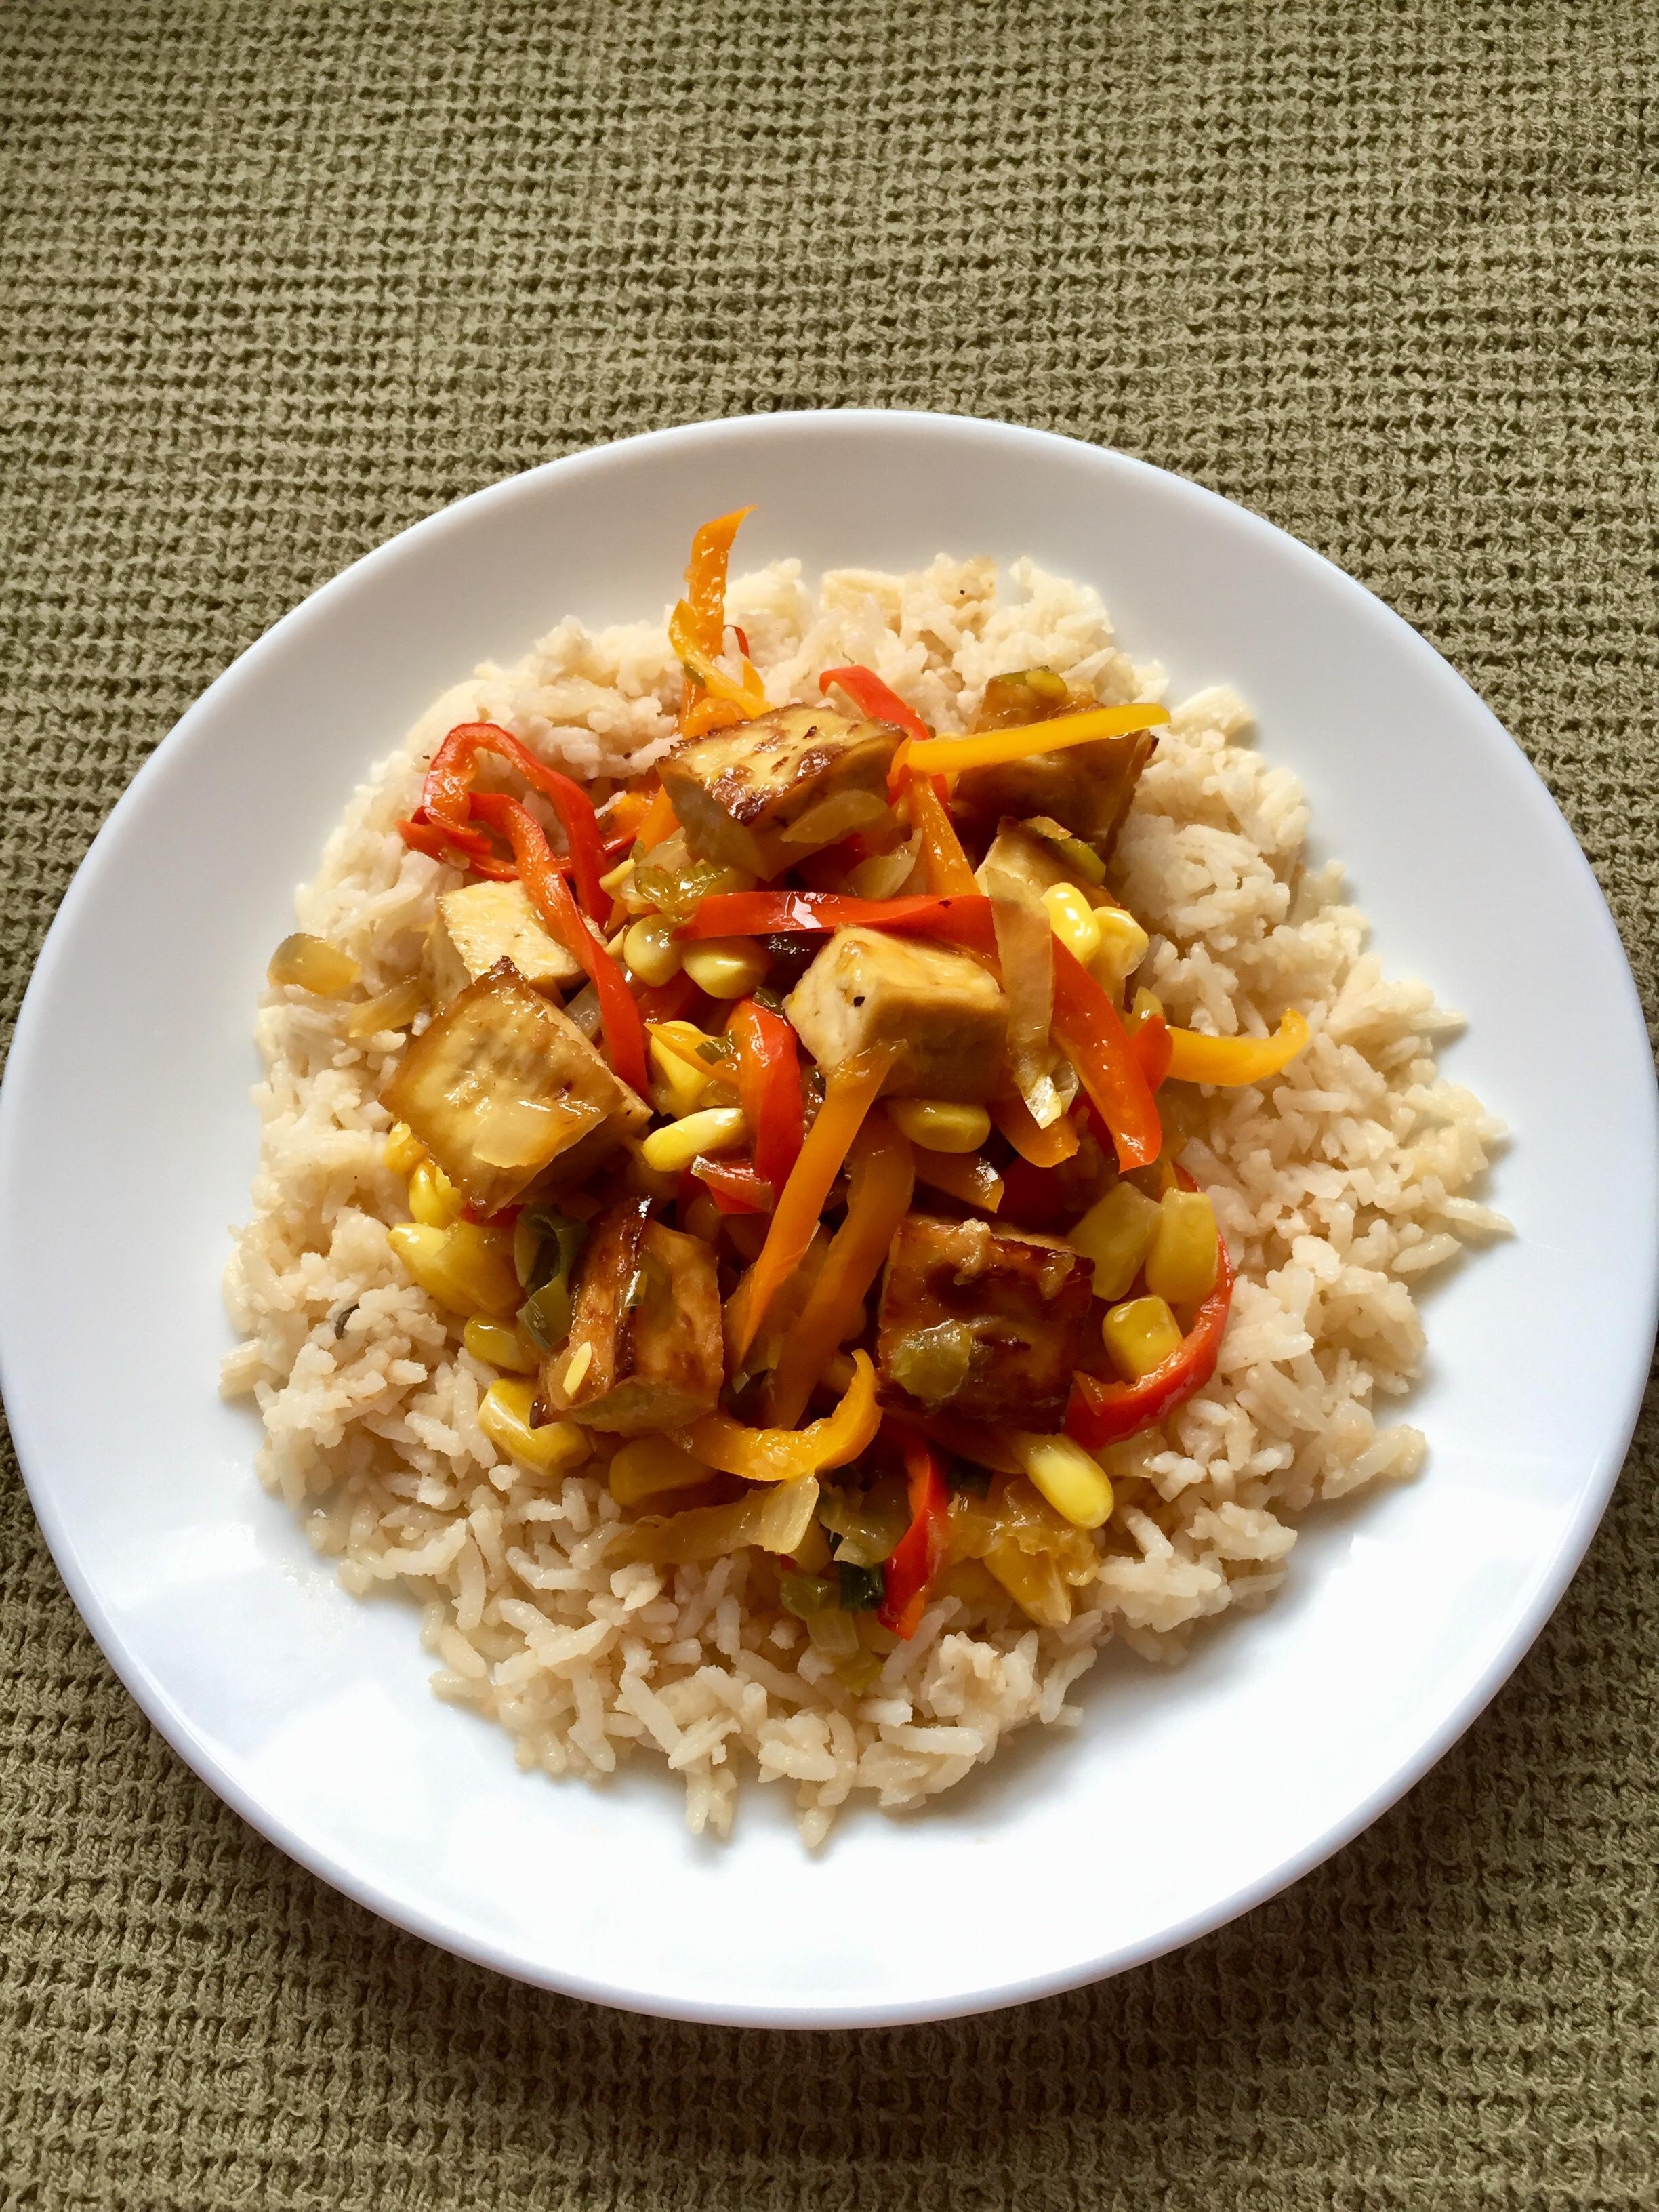 Tex-Mex Stir Fry with Crispy Tofu via Eat the Vegan Rainbow